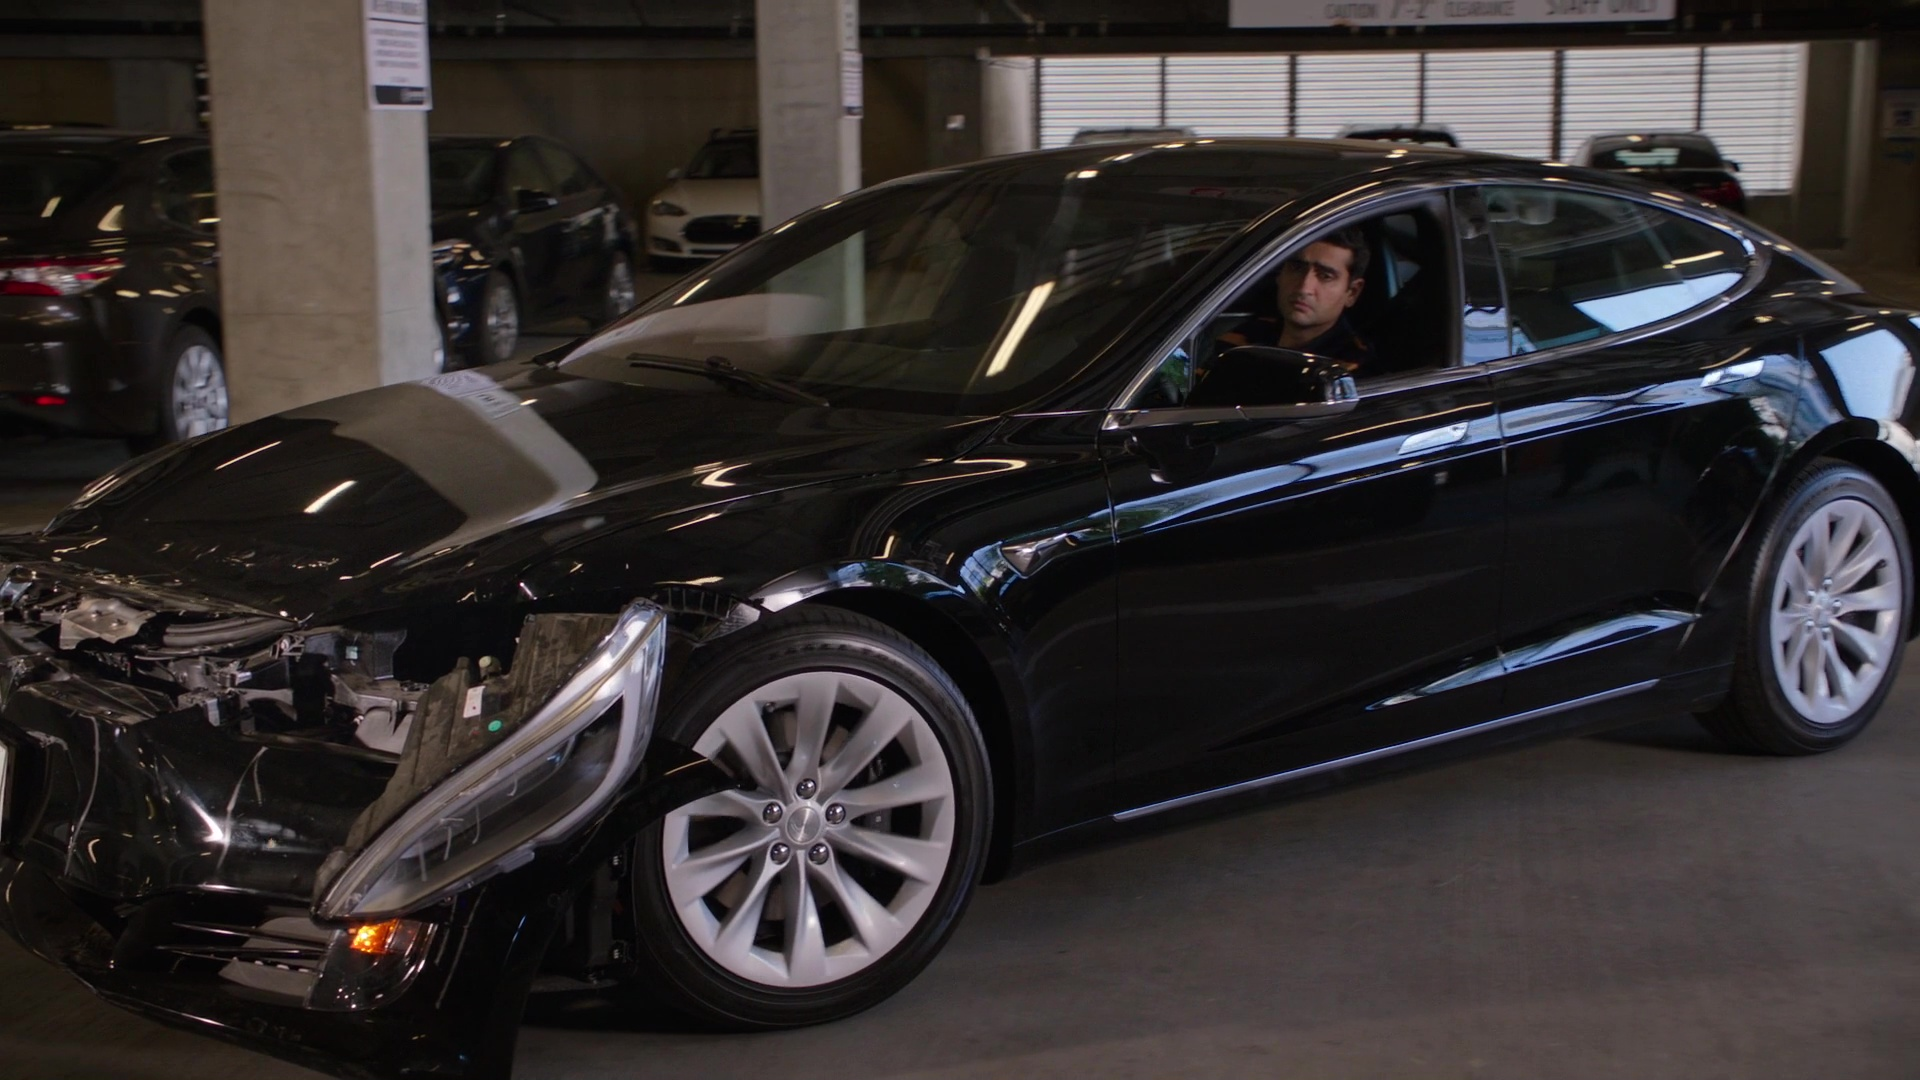 Tesla Model S Car Driven By Kumail Nanjiani Dinesh In